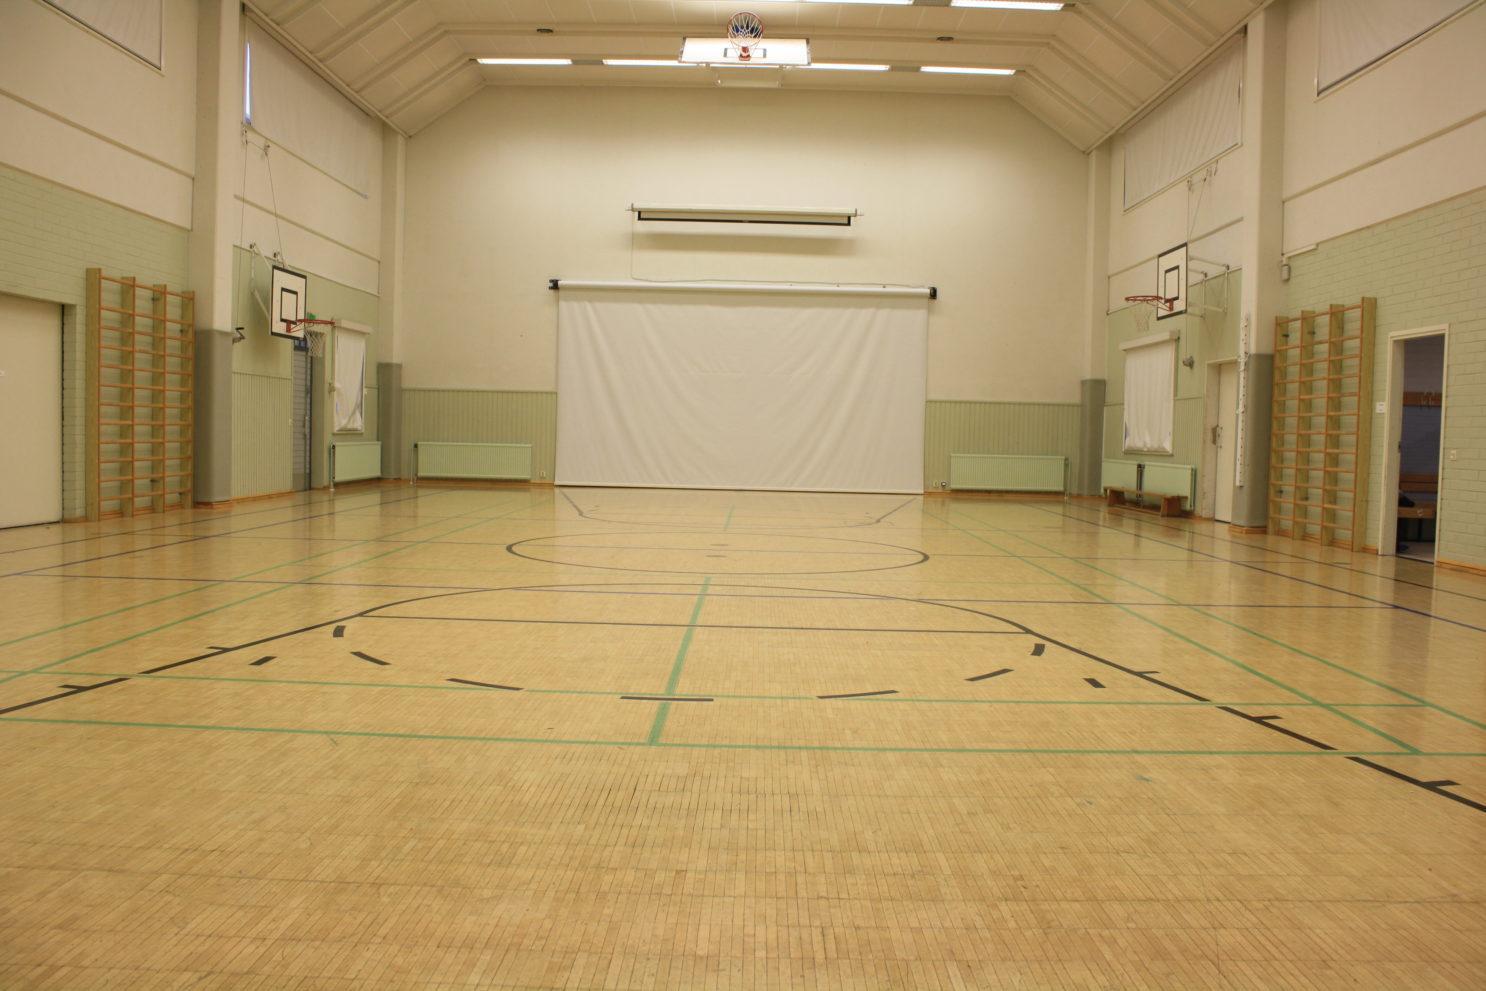 Nukarin koulun sali